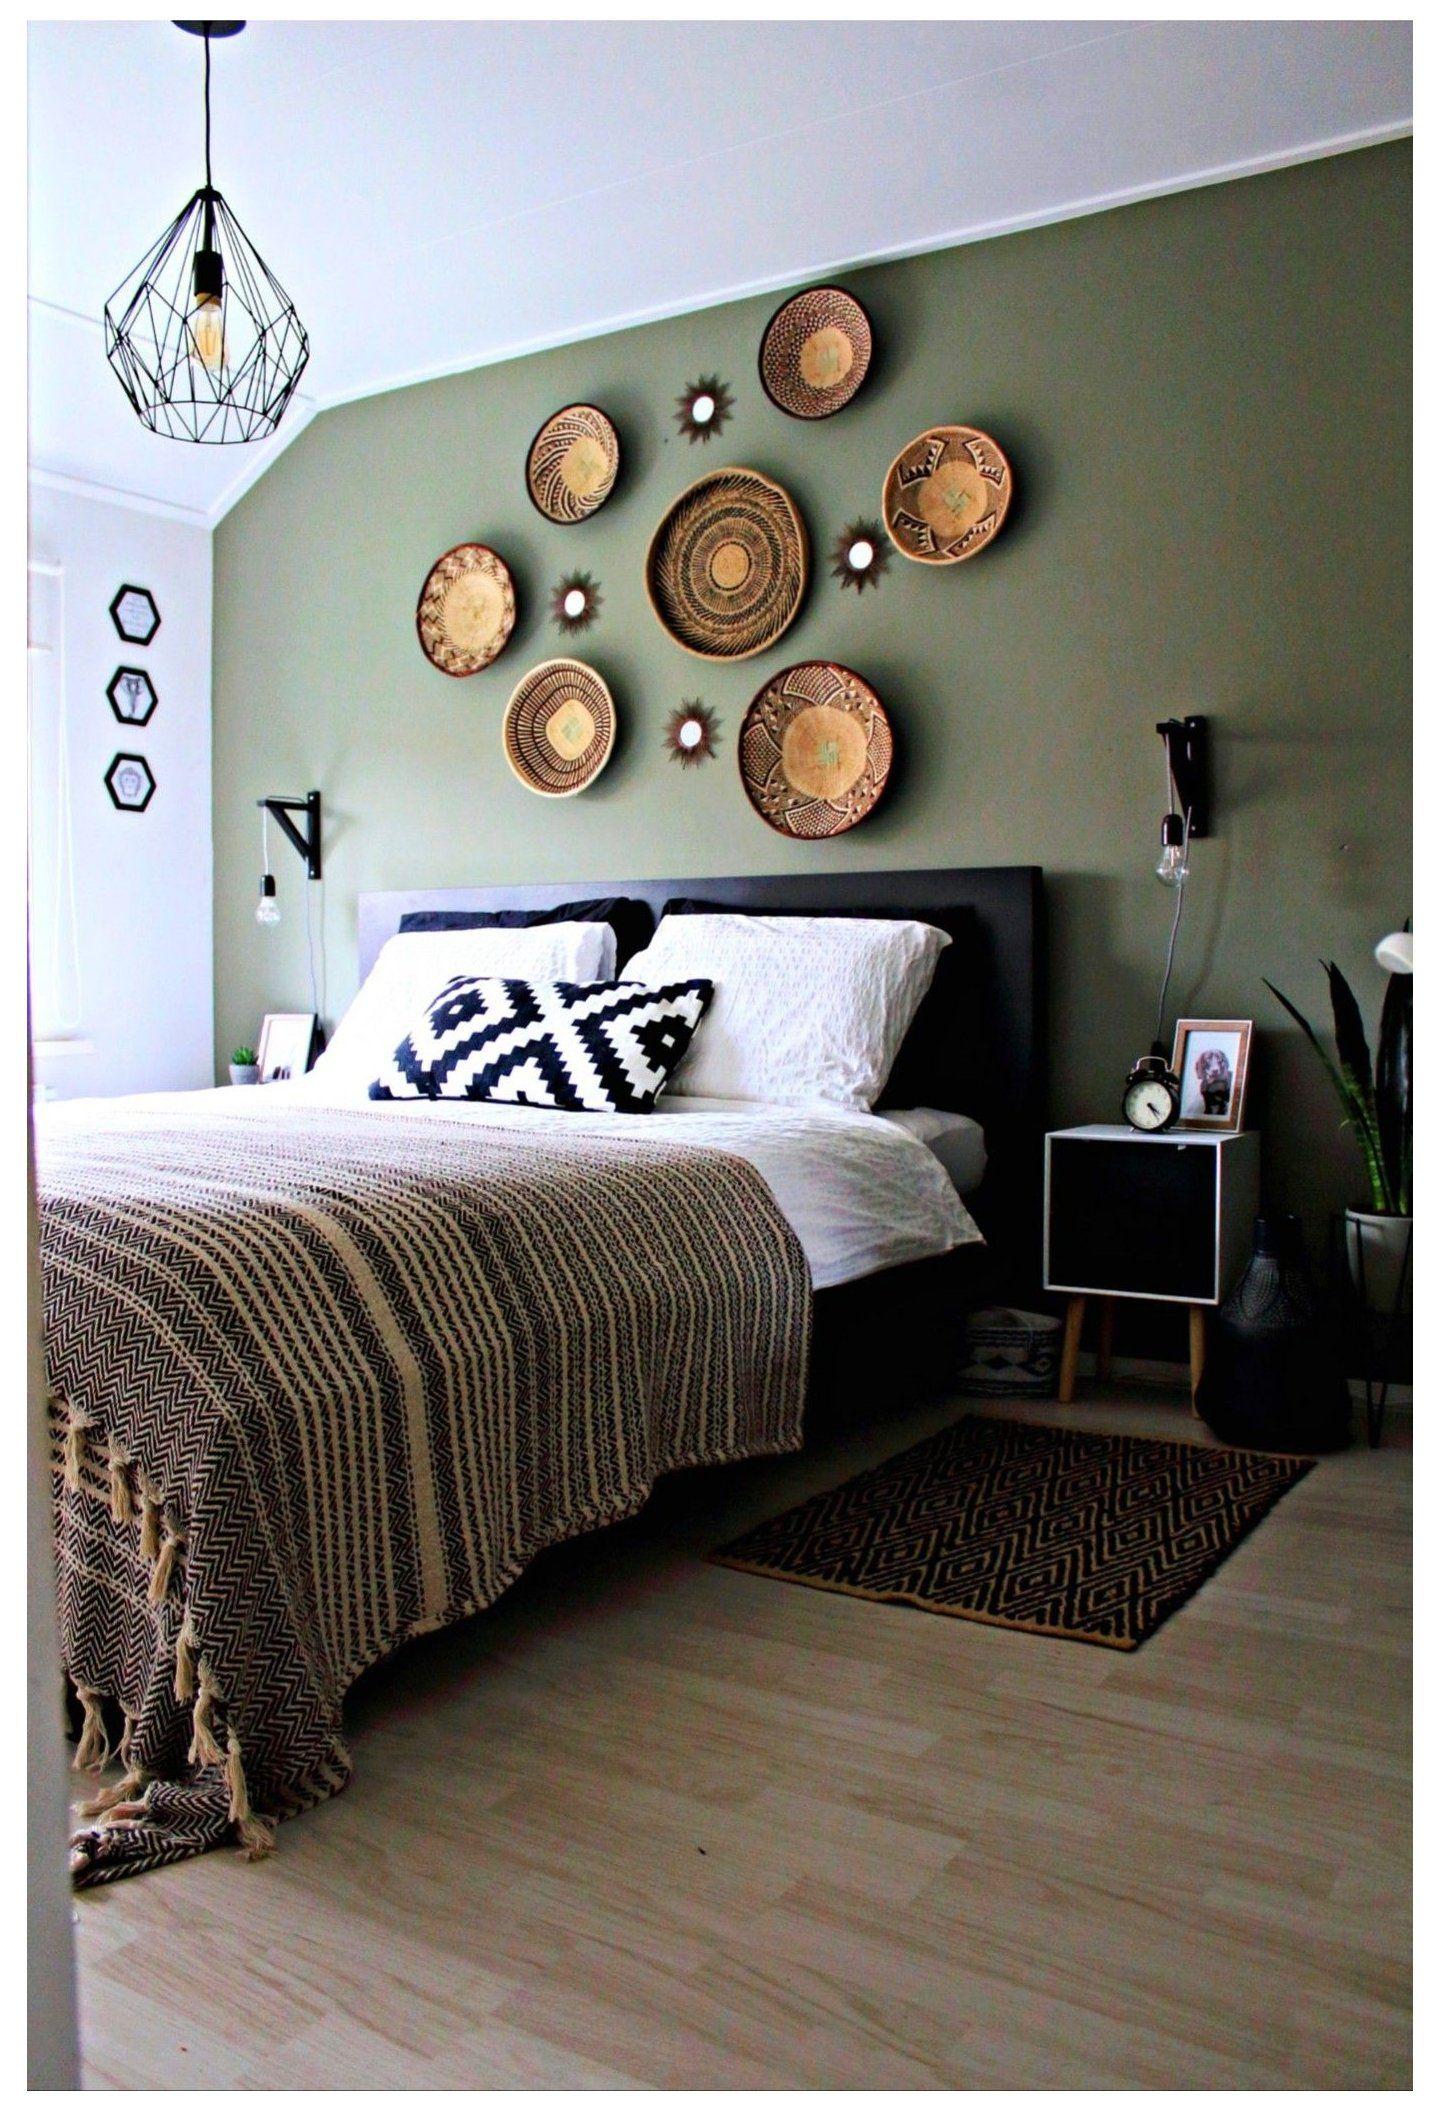 white baskets on wall #white #baskets #on #wall #w